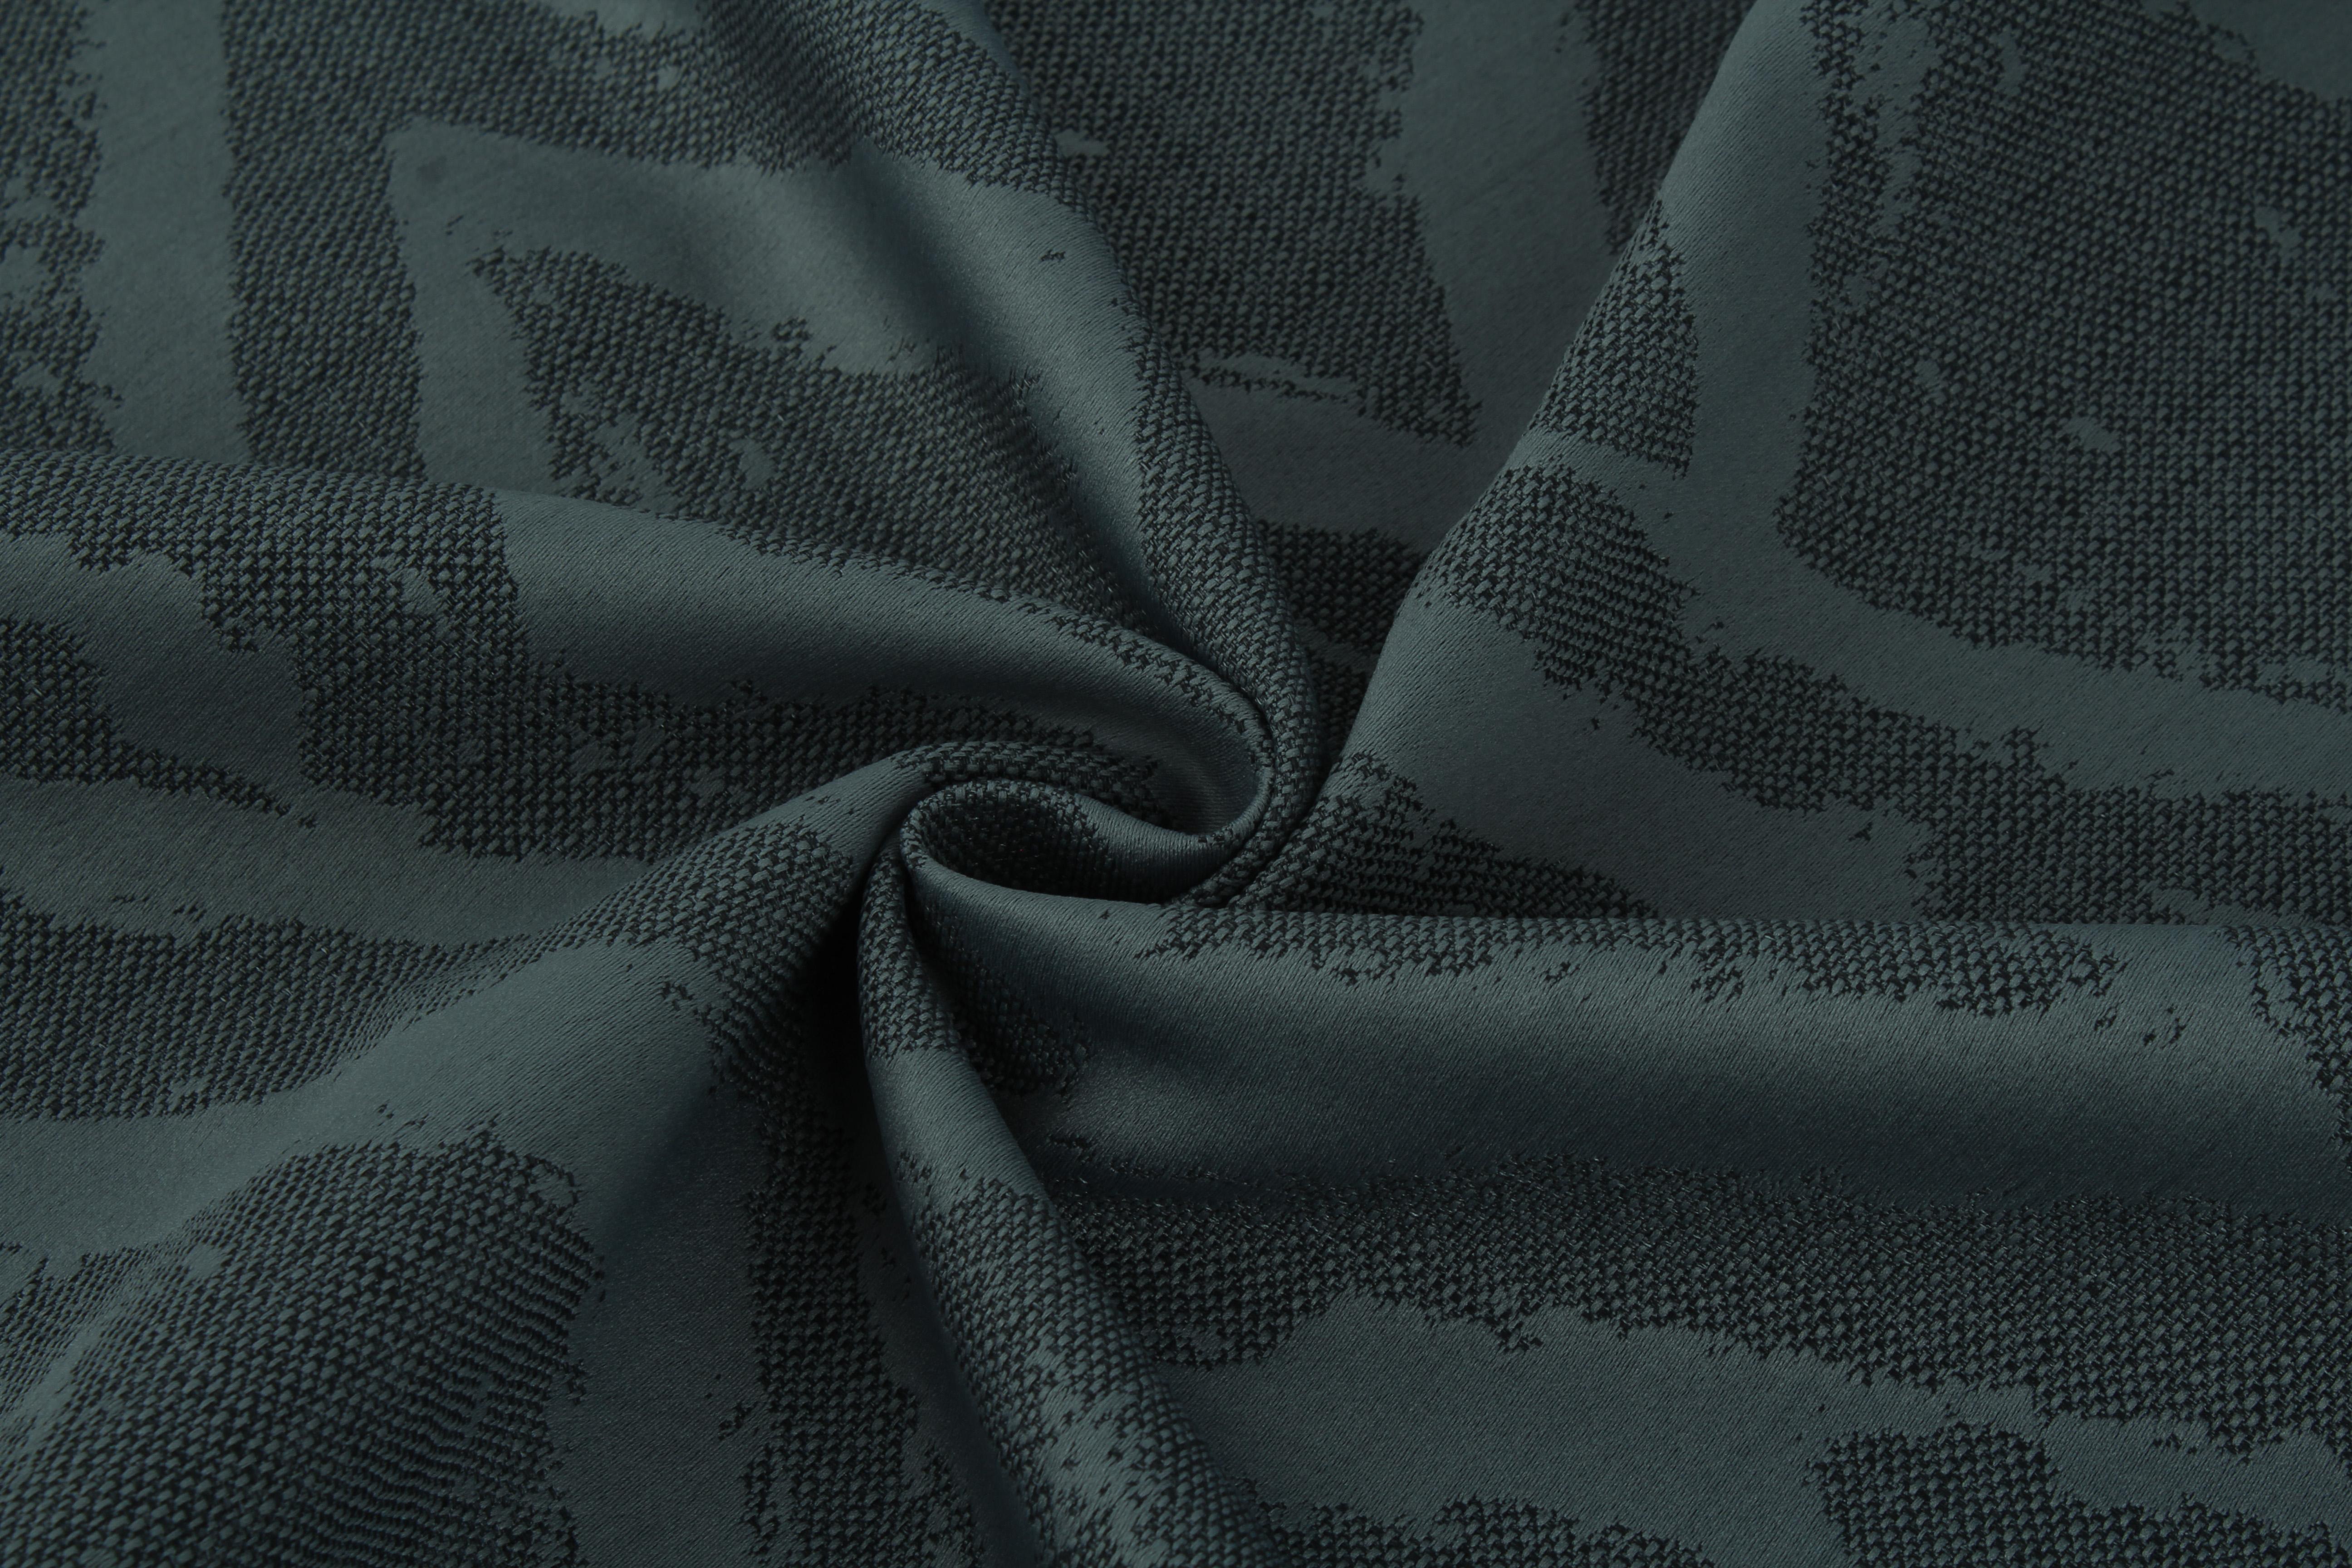 {} TexRepublic Материал Жаккард Rhombuses Цвет: Серый